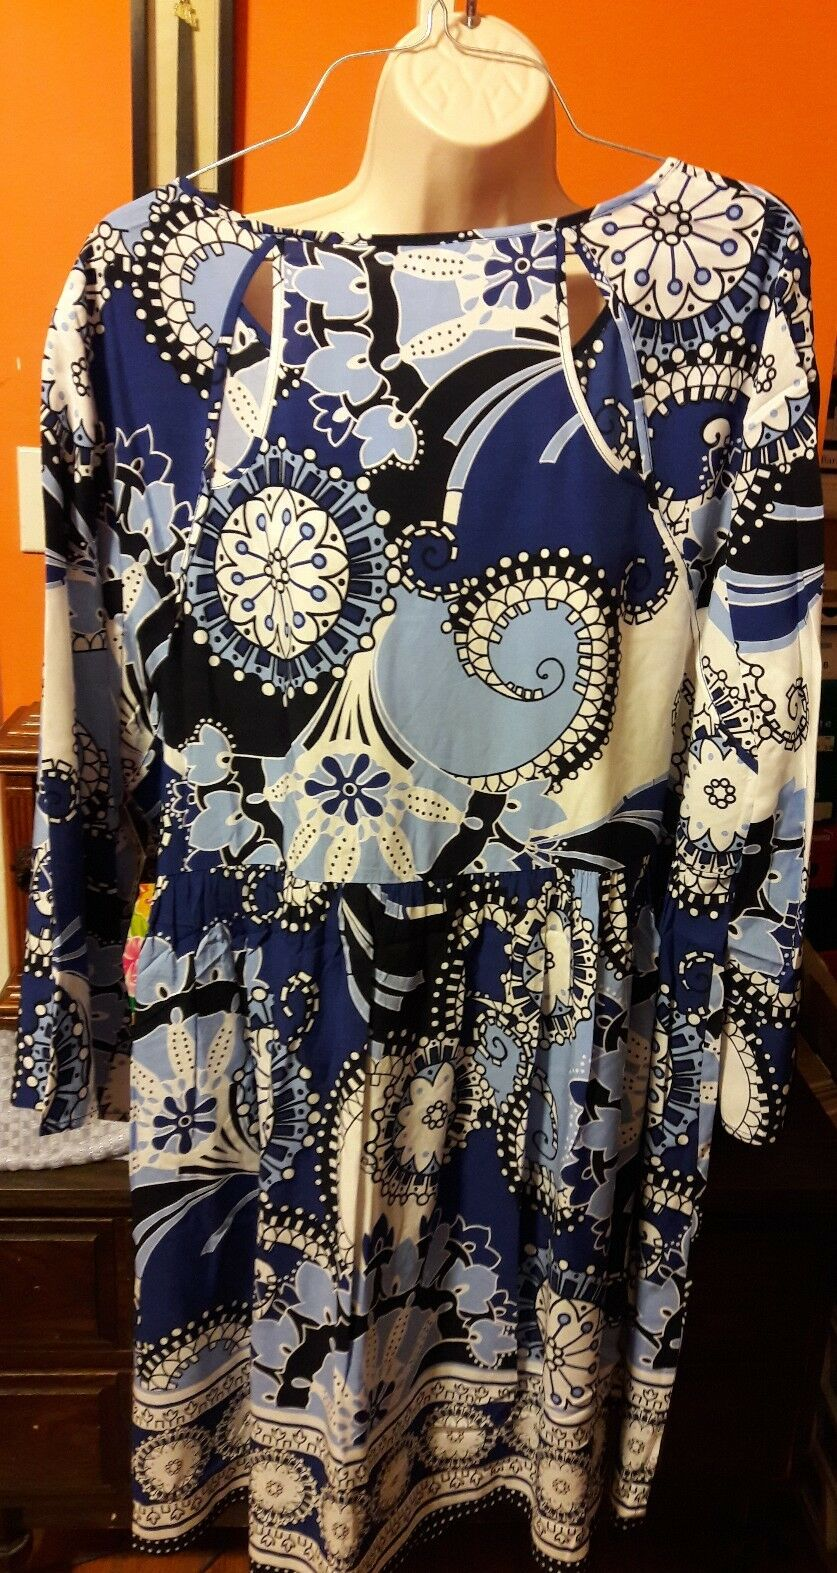 Crown & & & Ivy Ladies Print Dress Size XL 0b20fa